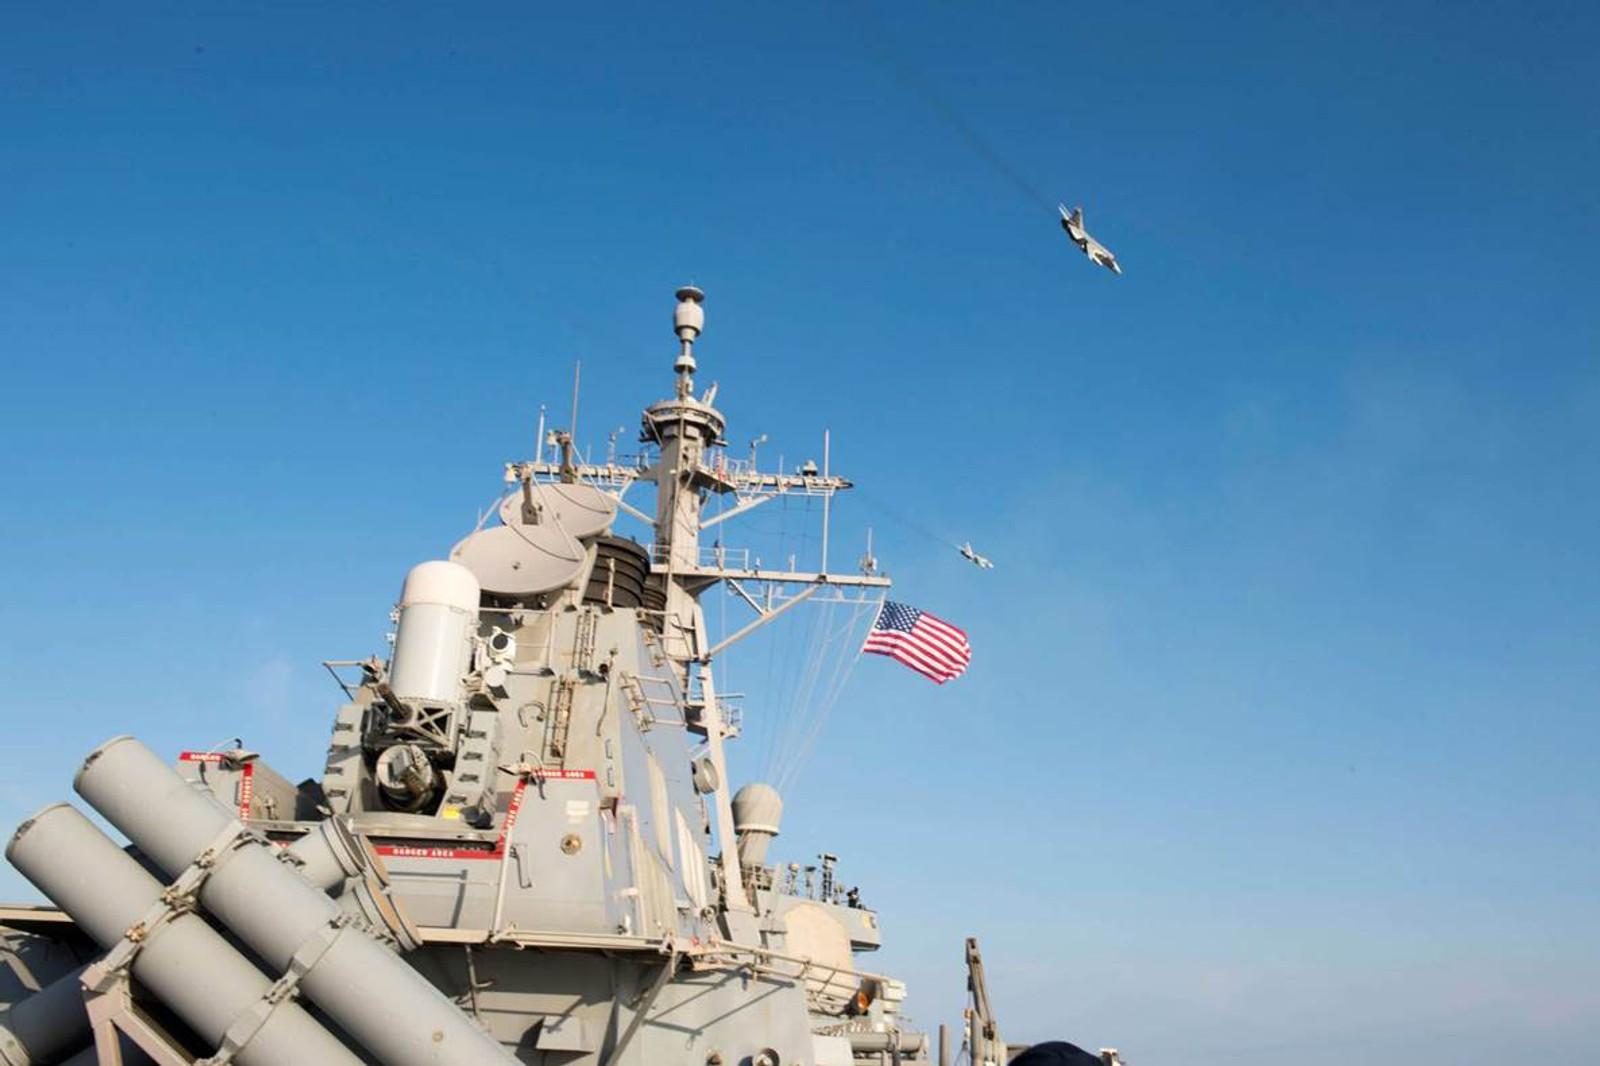 Jagerflyene som fløy over skipet Donald Cook har provosert amerikanerne stort.